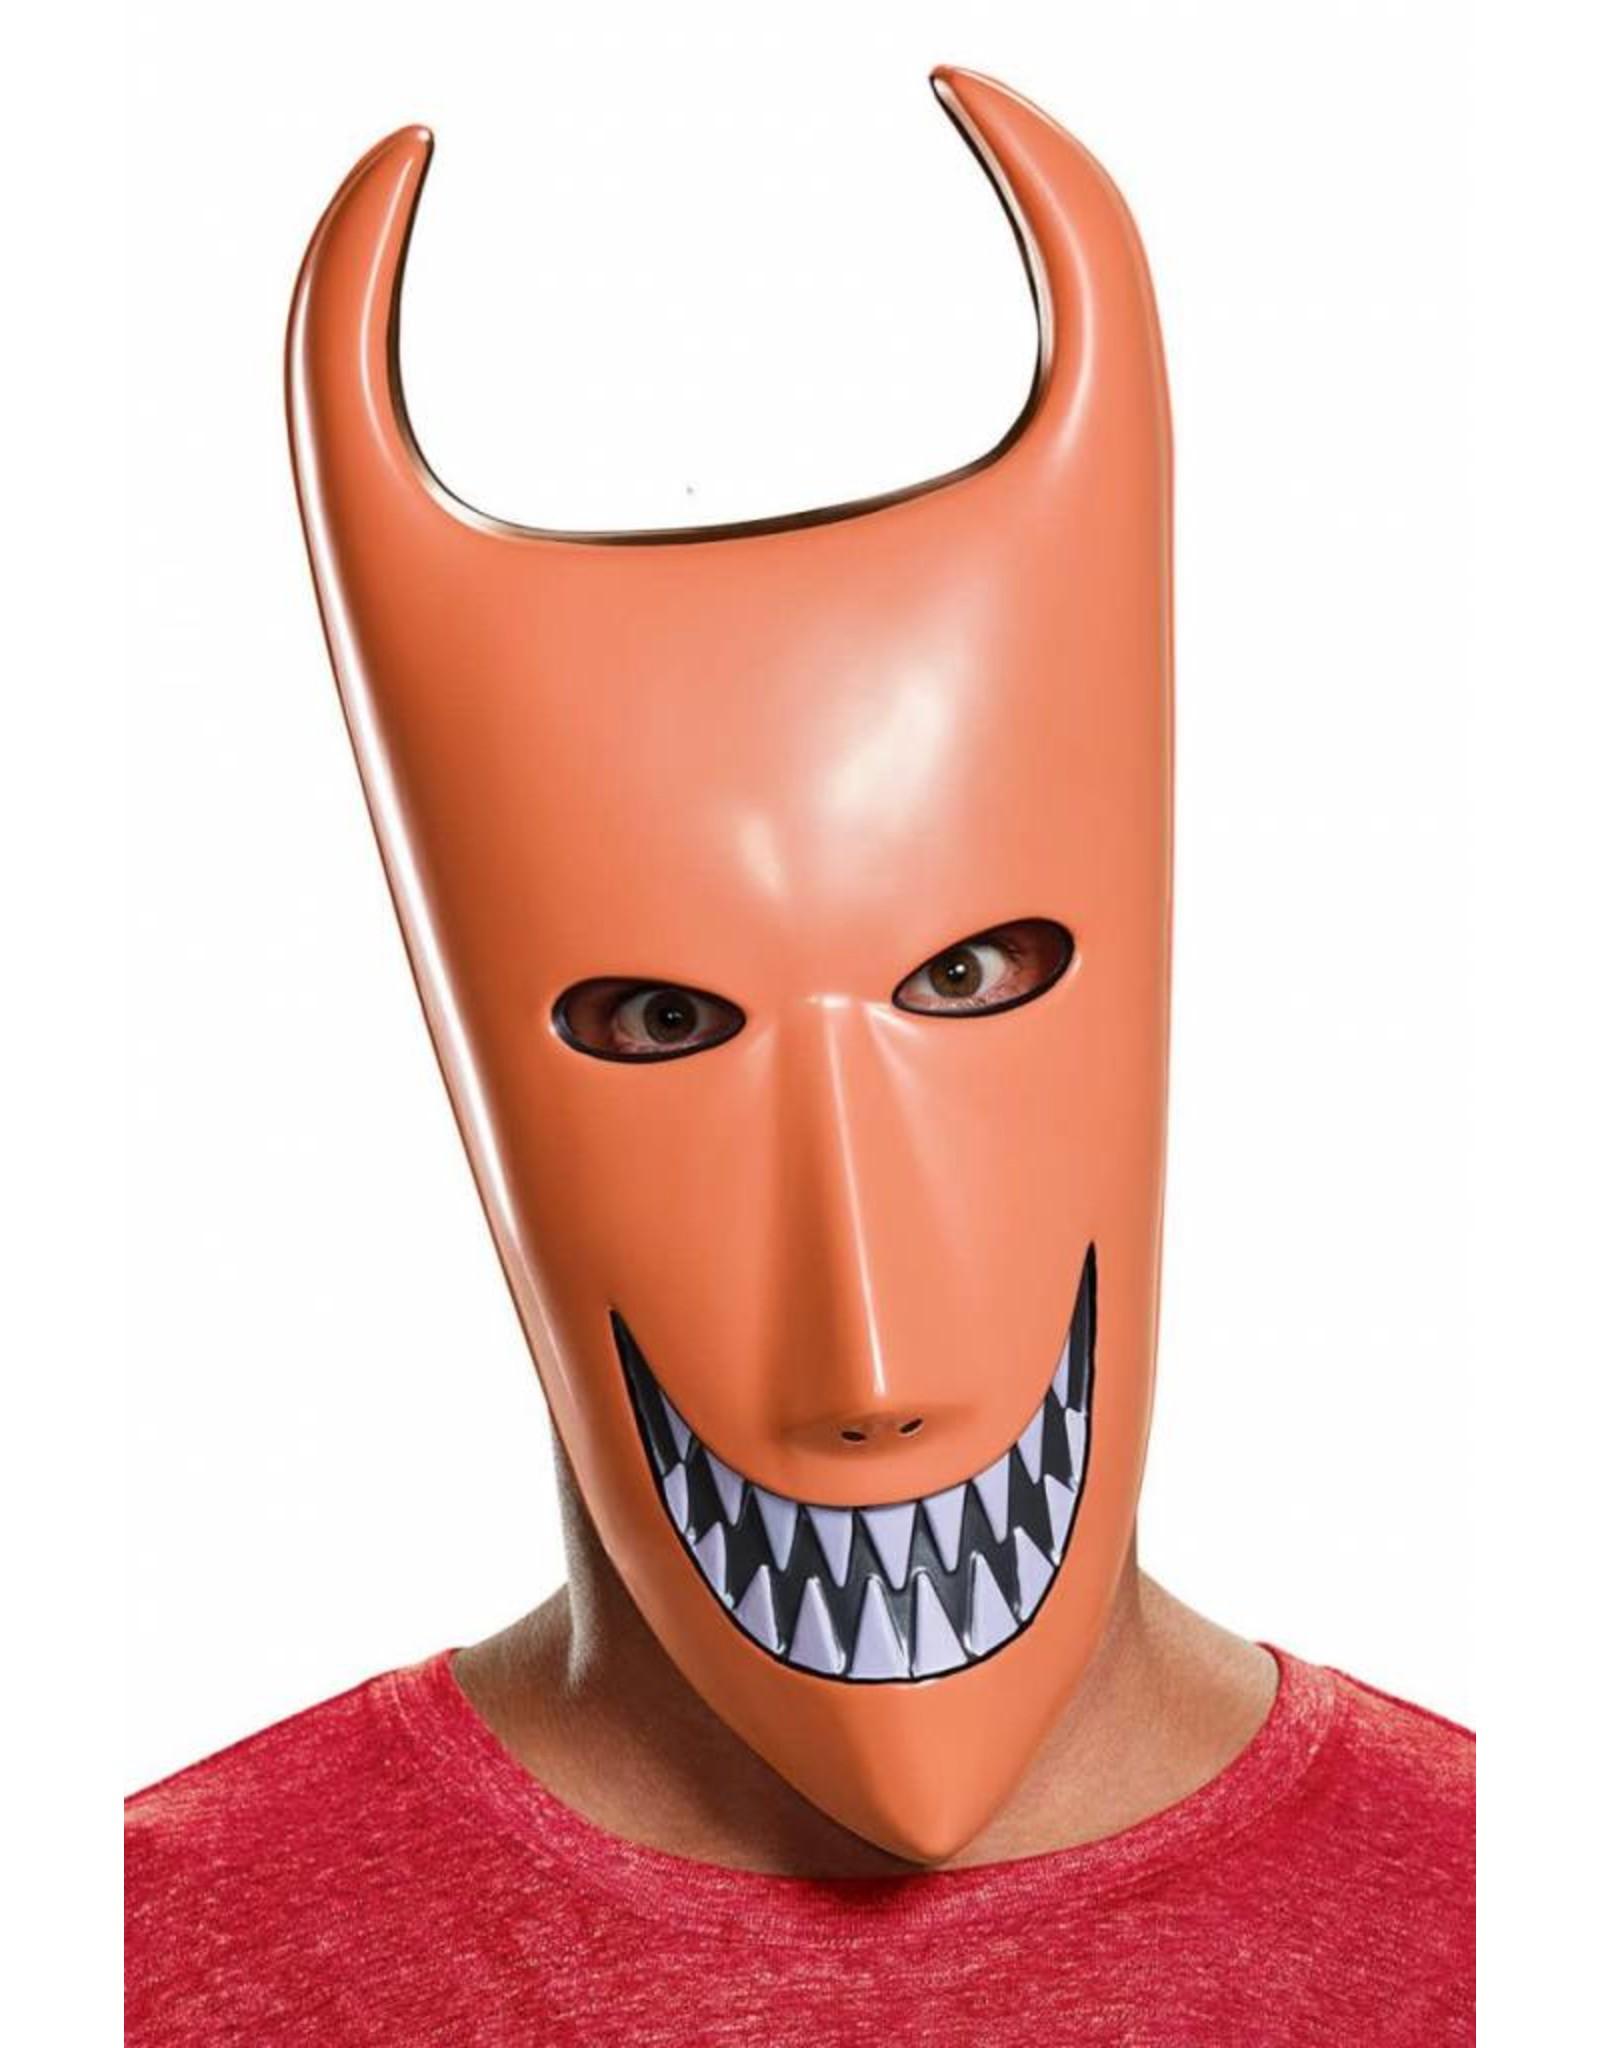 Disguise NBC Lock Mask